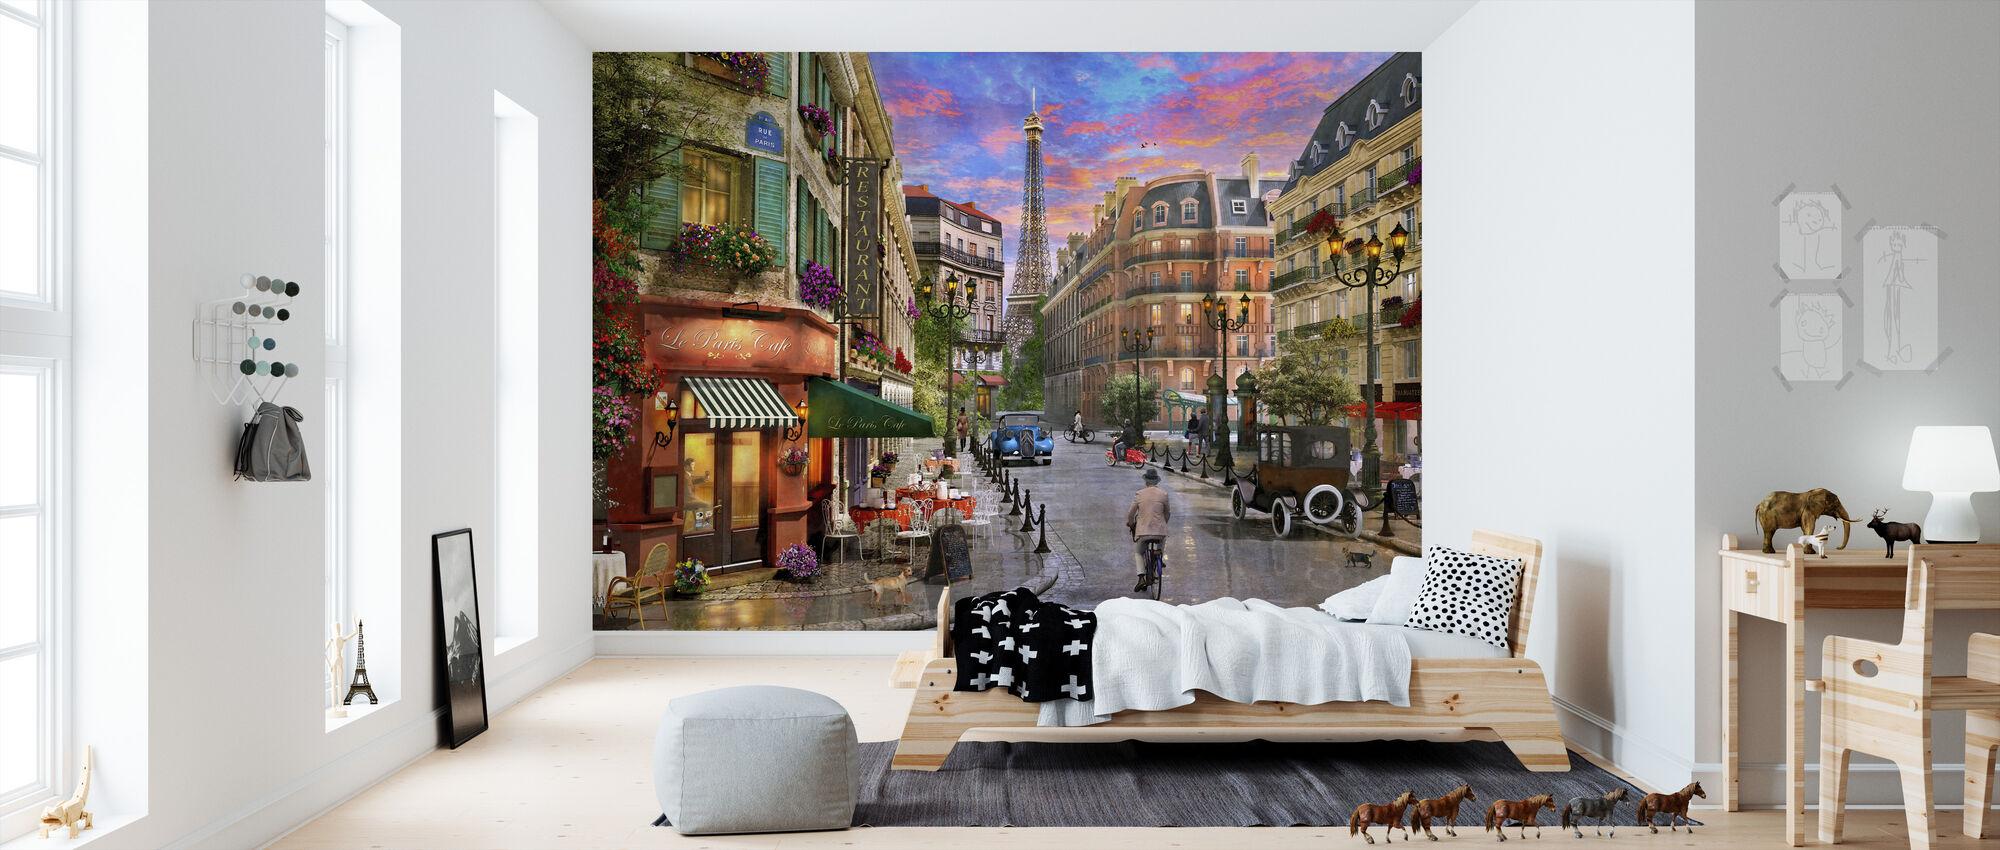 Paris Street - Wallpaper - Kids Room